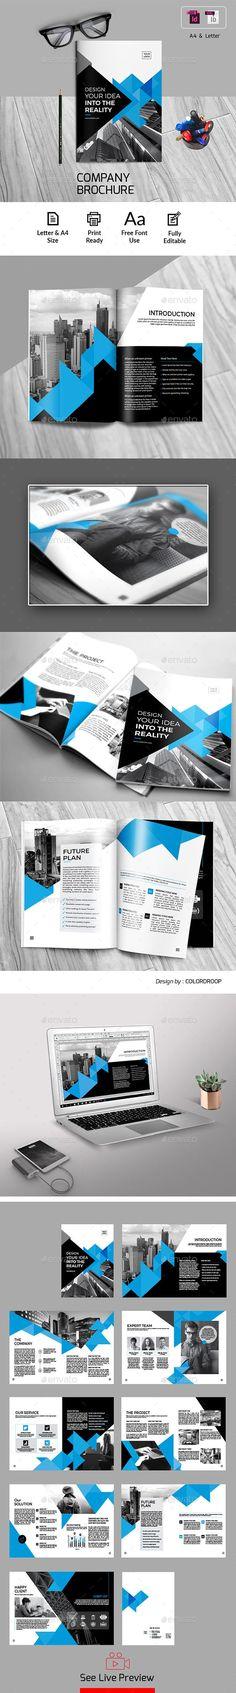 27 Best Free Brochure Templates Images Free Brochure Brochure